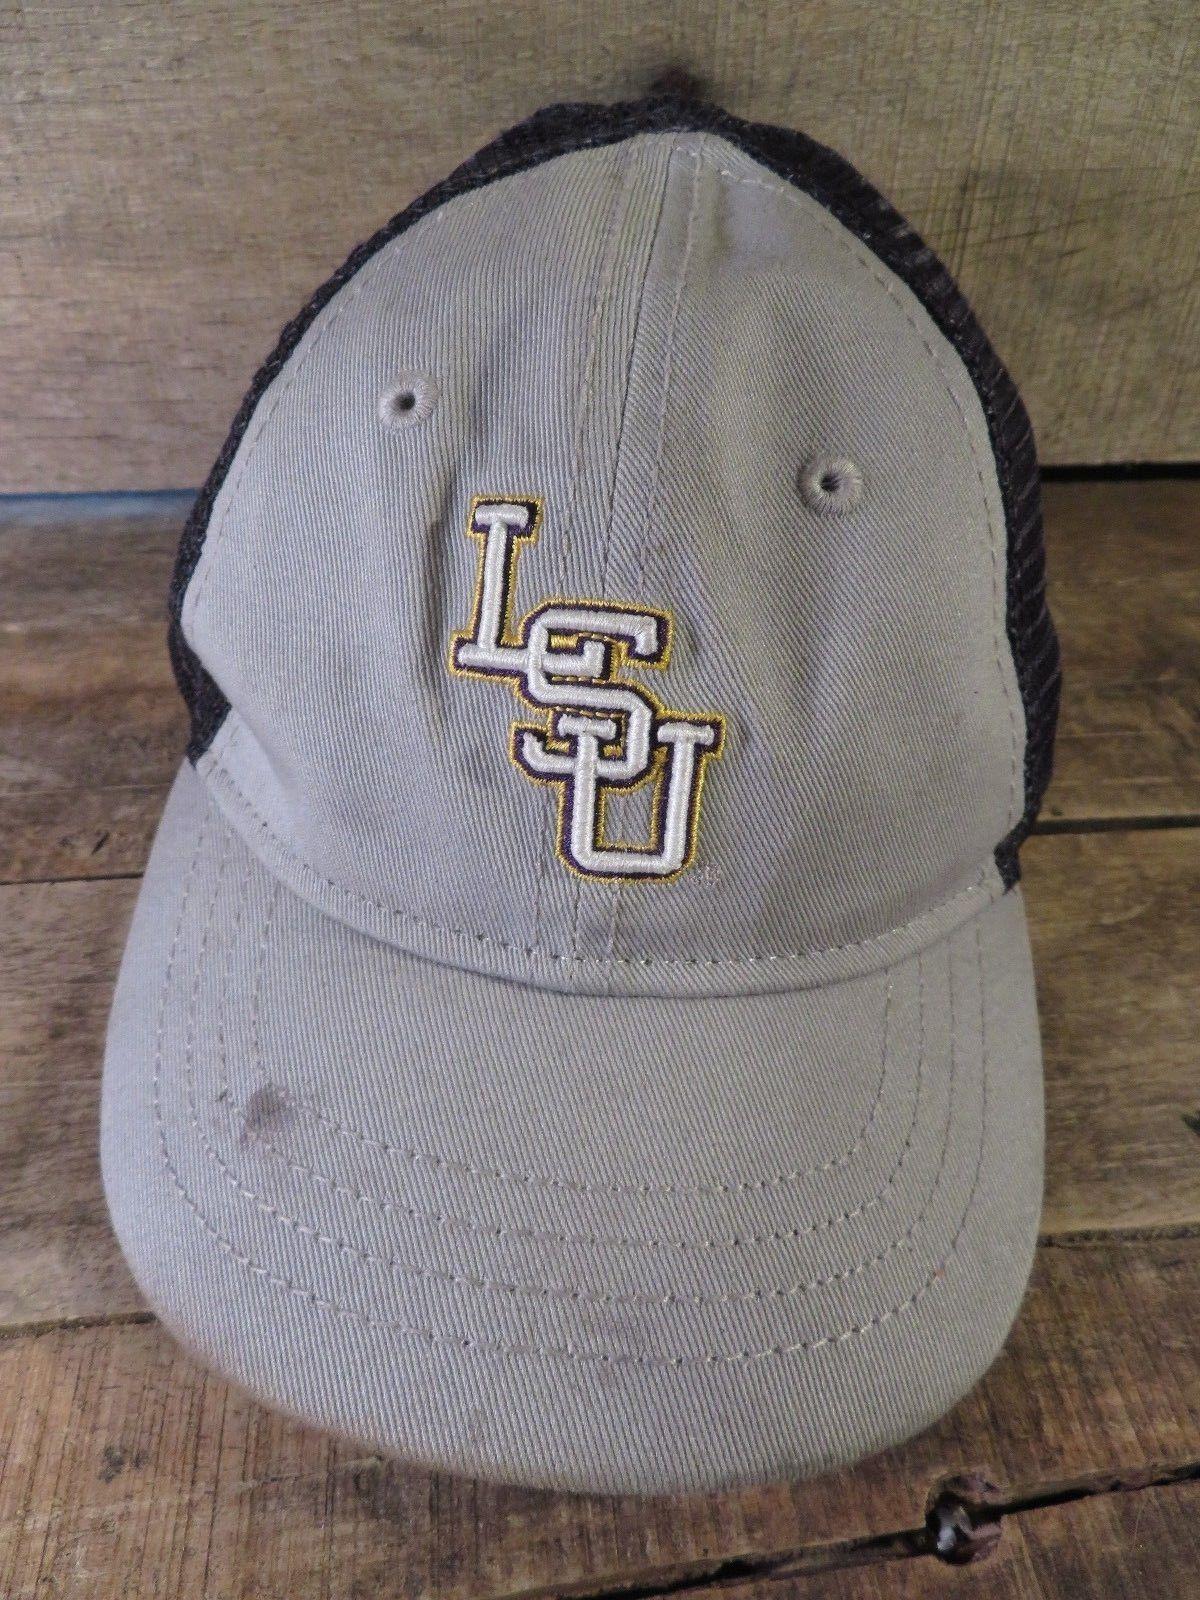 Lsu Louisiana State University New Era Bambino Neonato Cappello